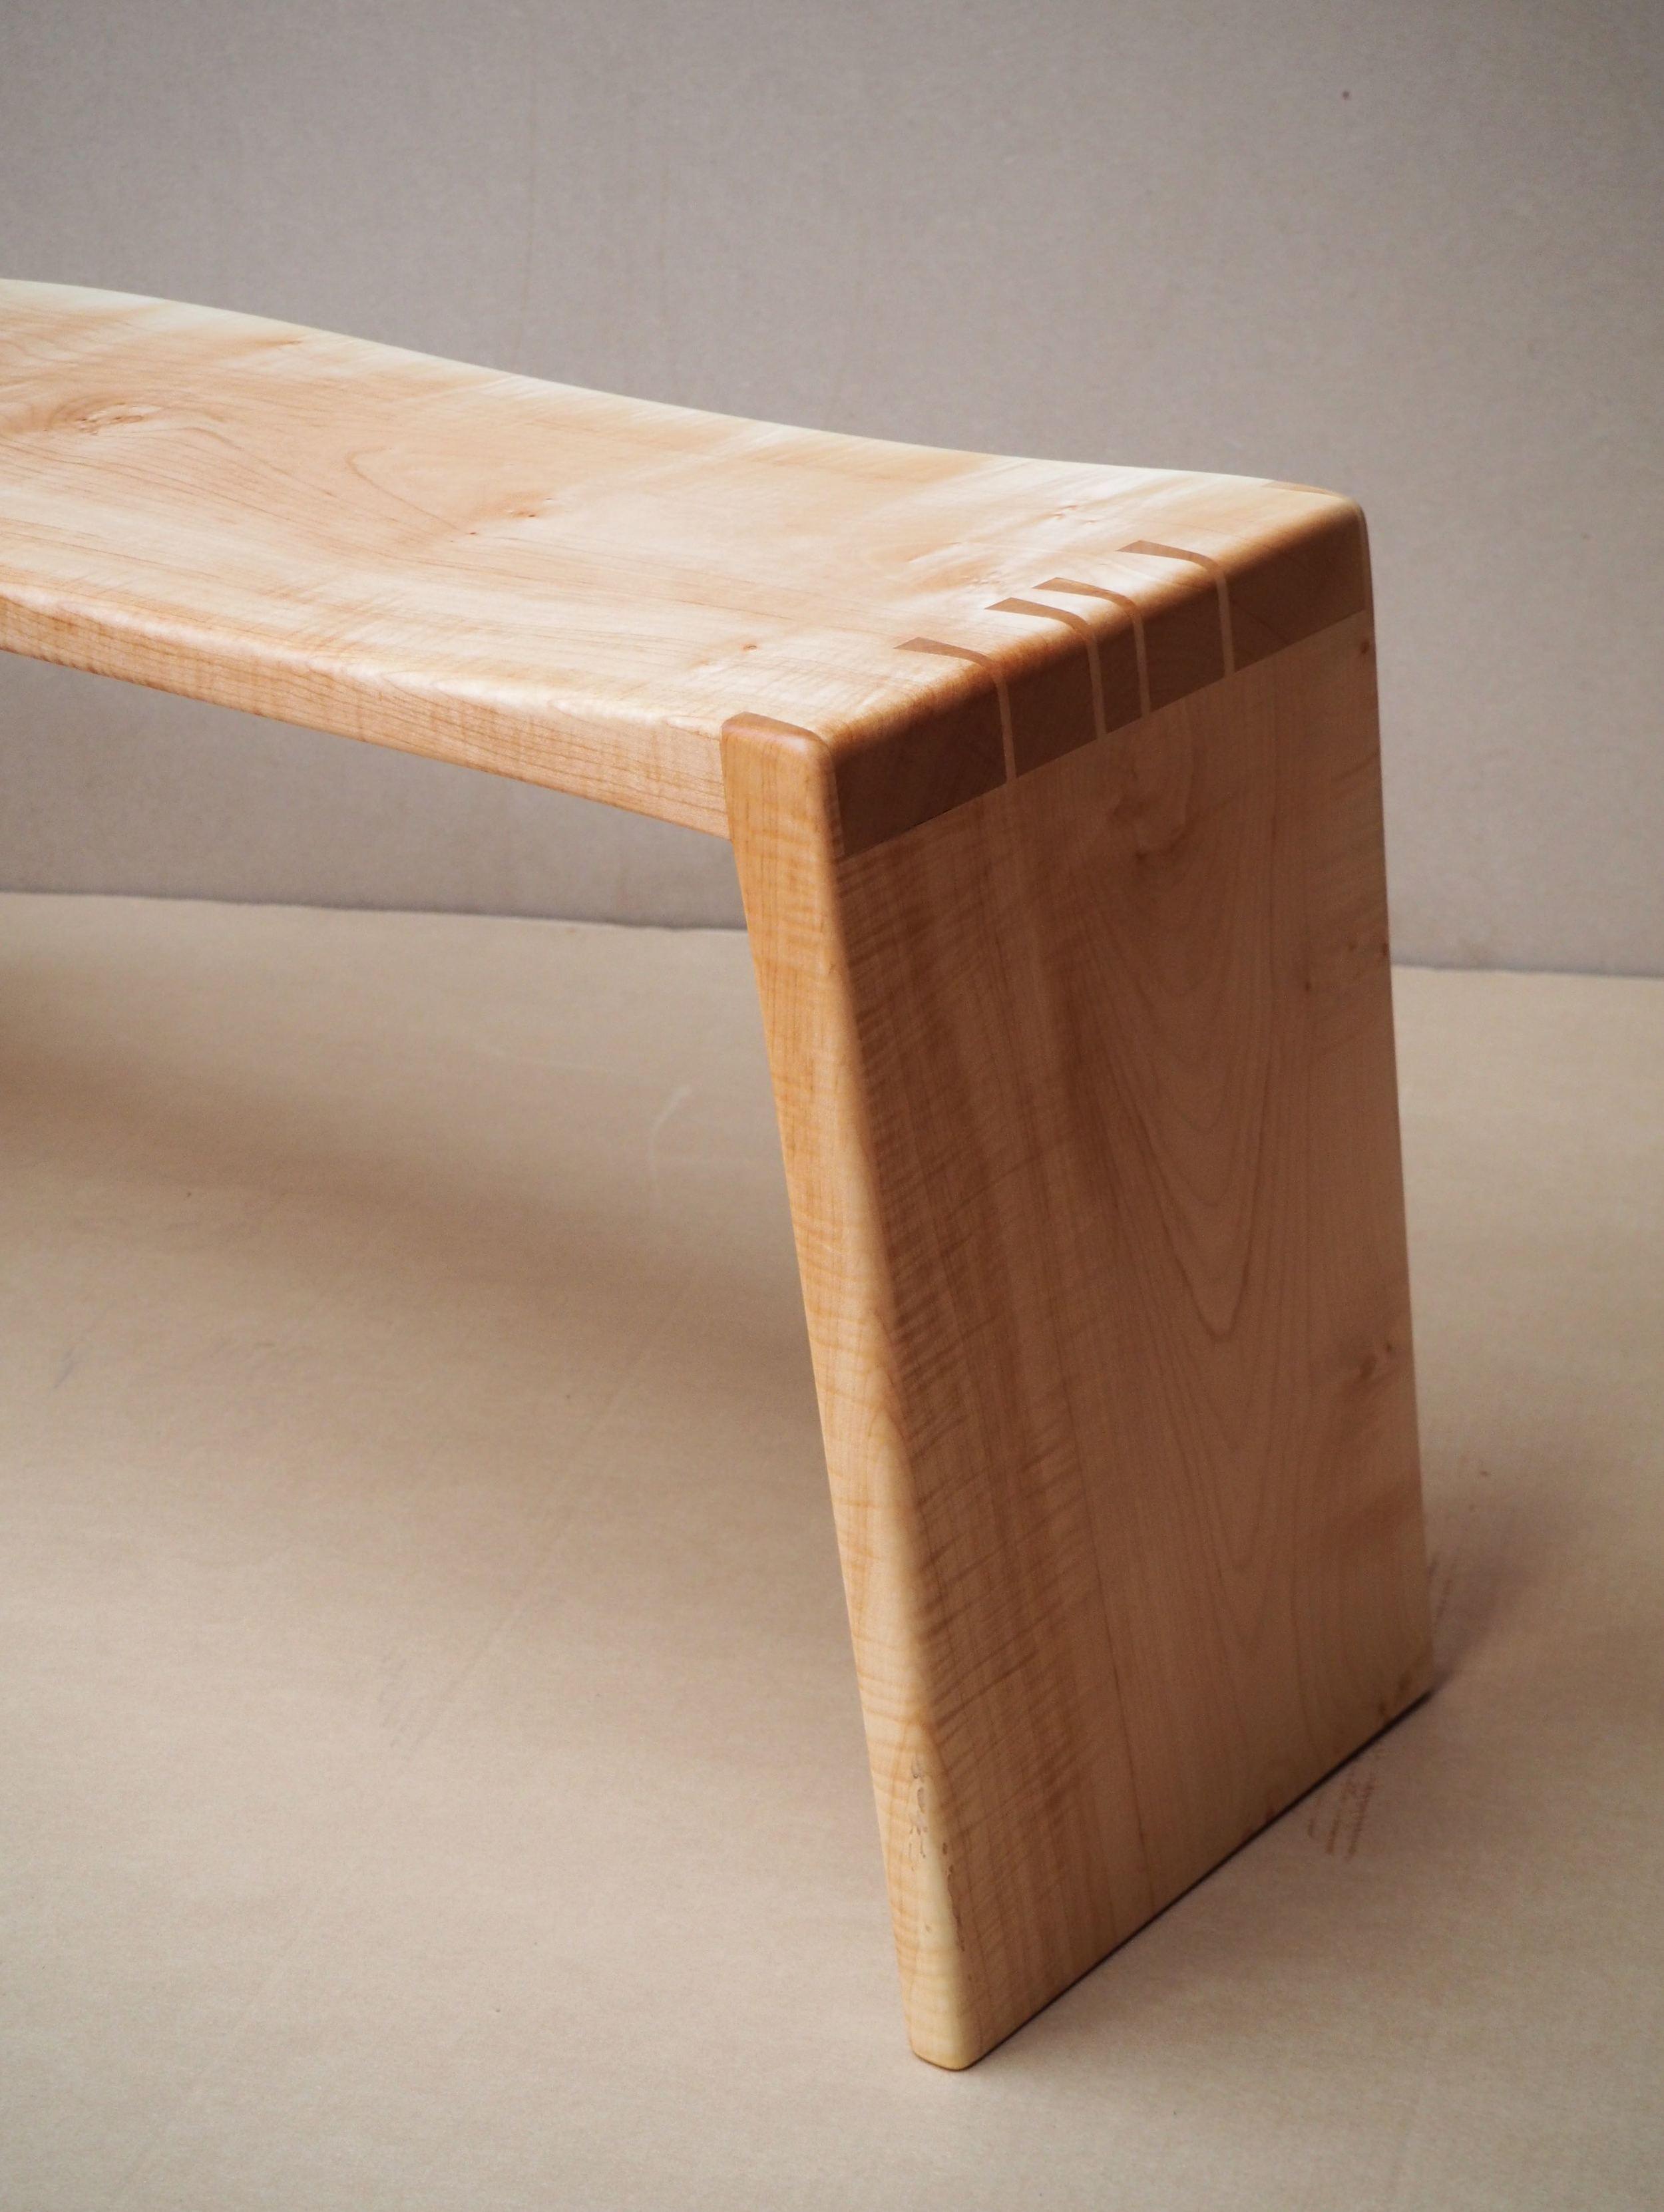 Maple Bench Seat3 copy.jpg